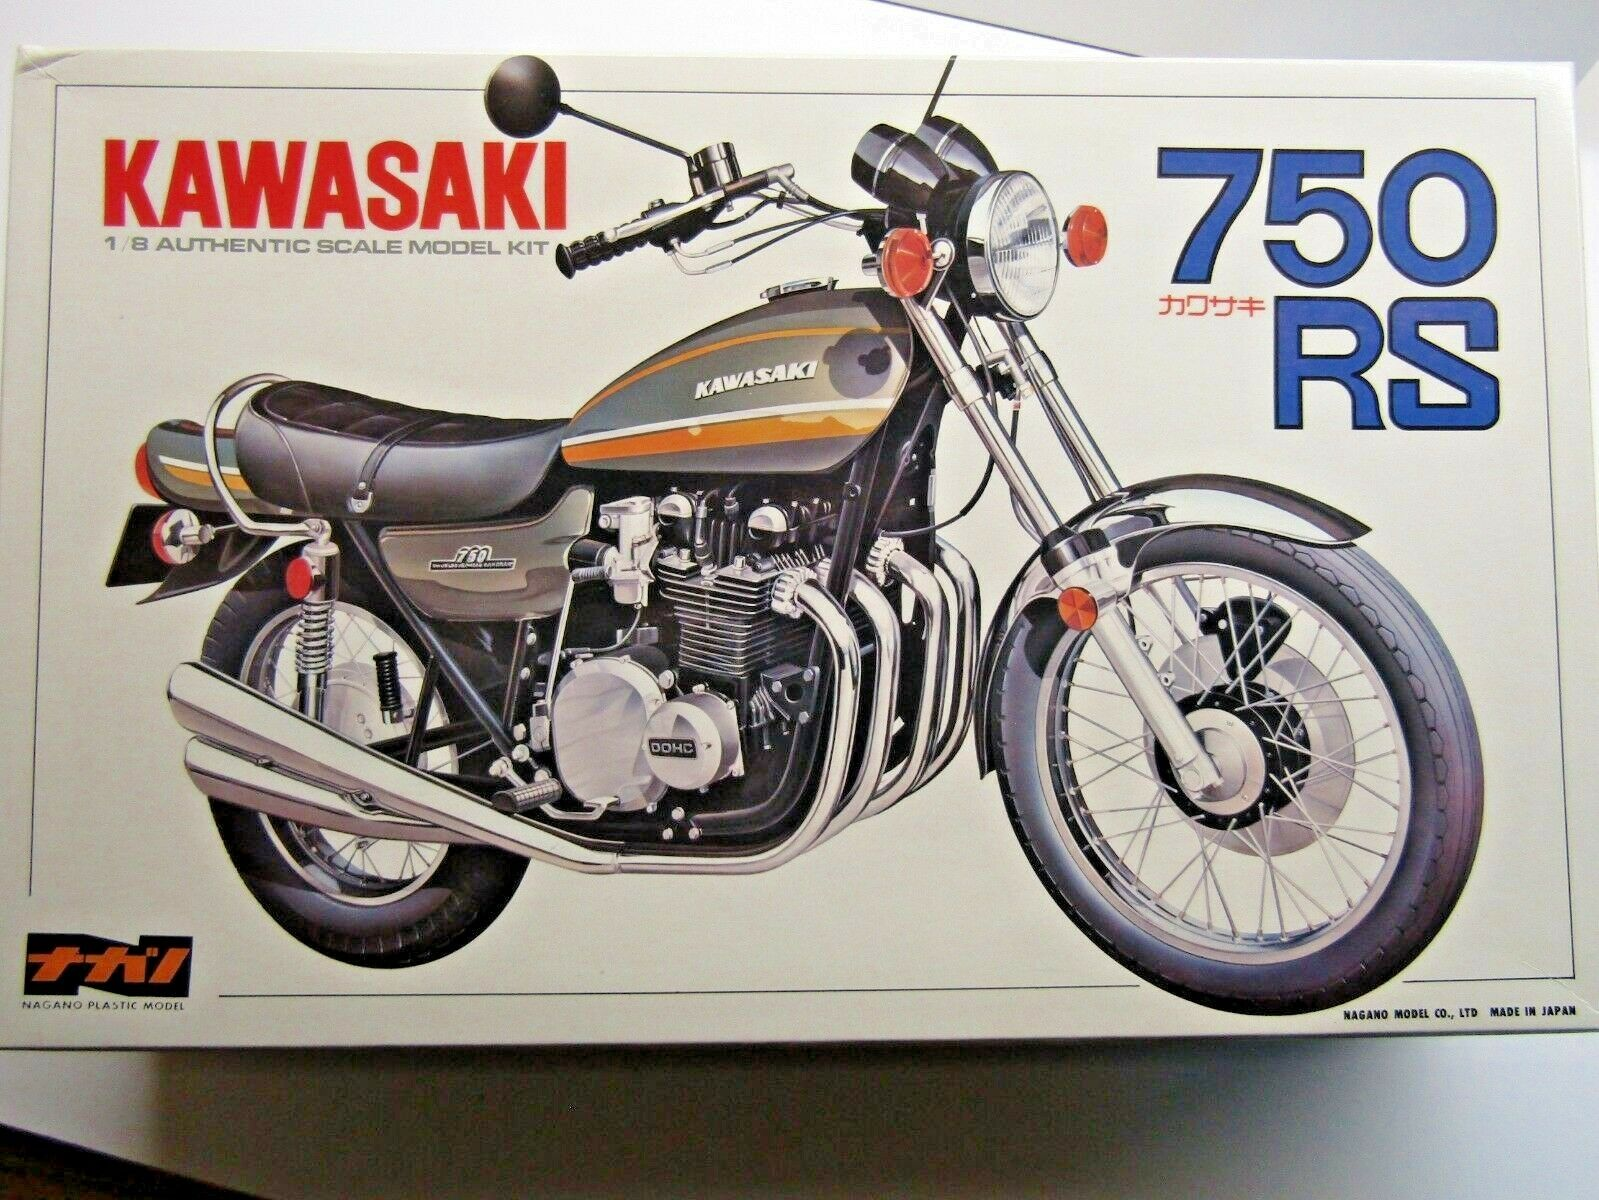 Nagano Vintage 1 8 Scale Kawasaki 750RS (Z1 900) Model Kit - New & Rare